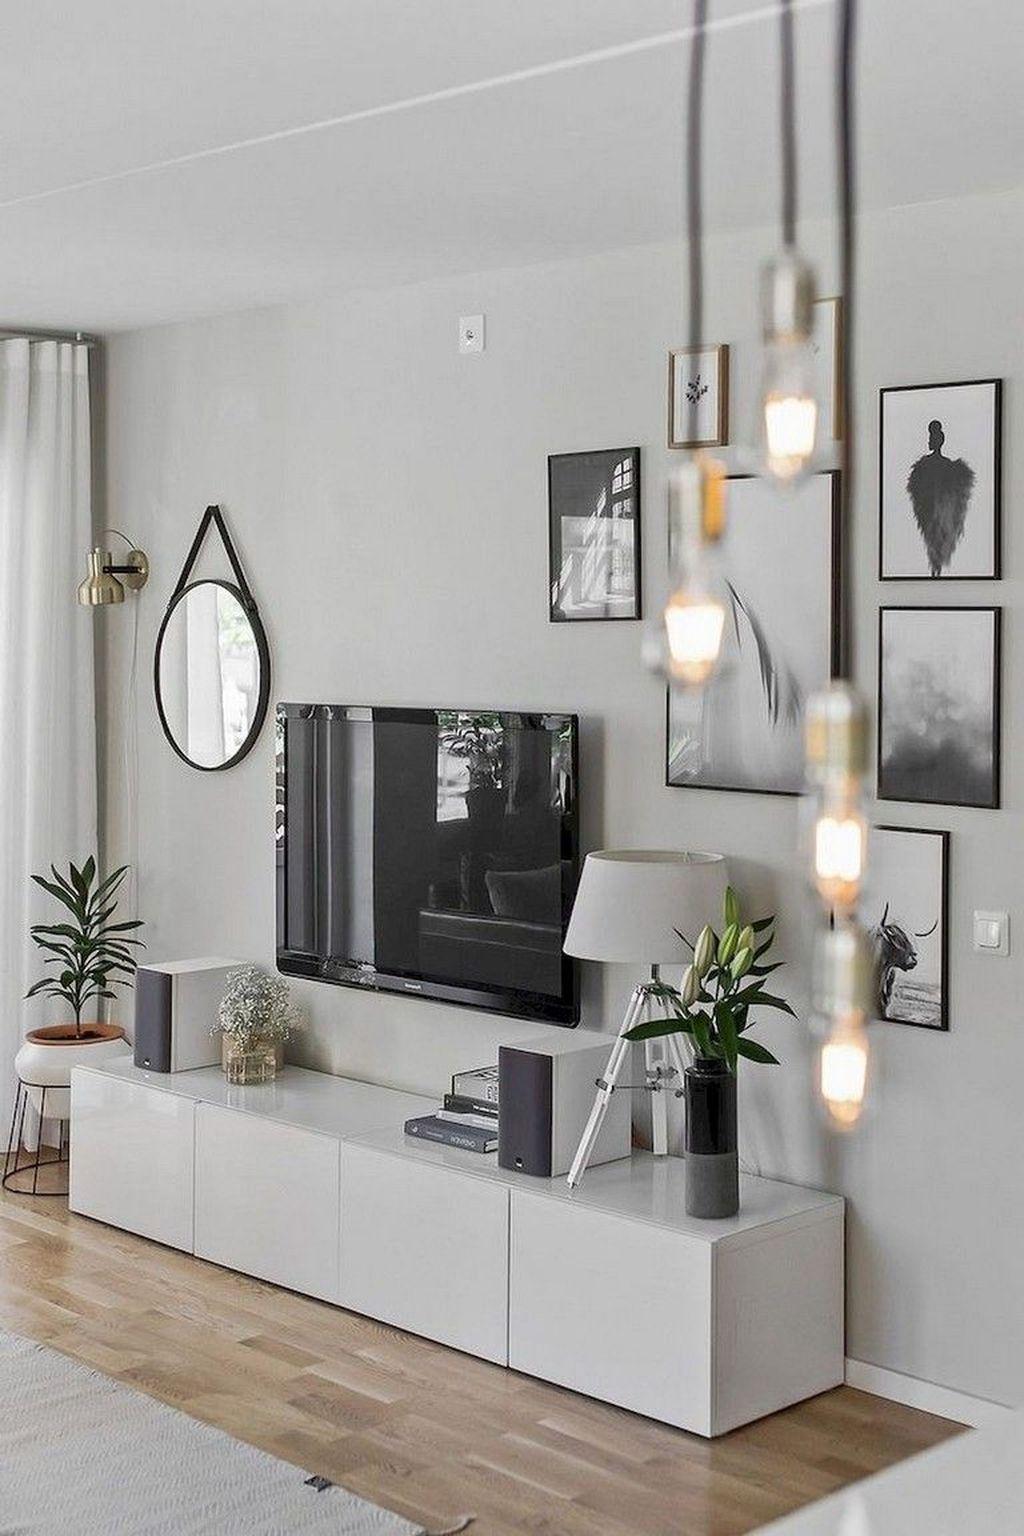 Inspiring Small Living Room Decor Ideas 04